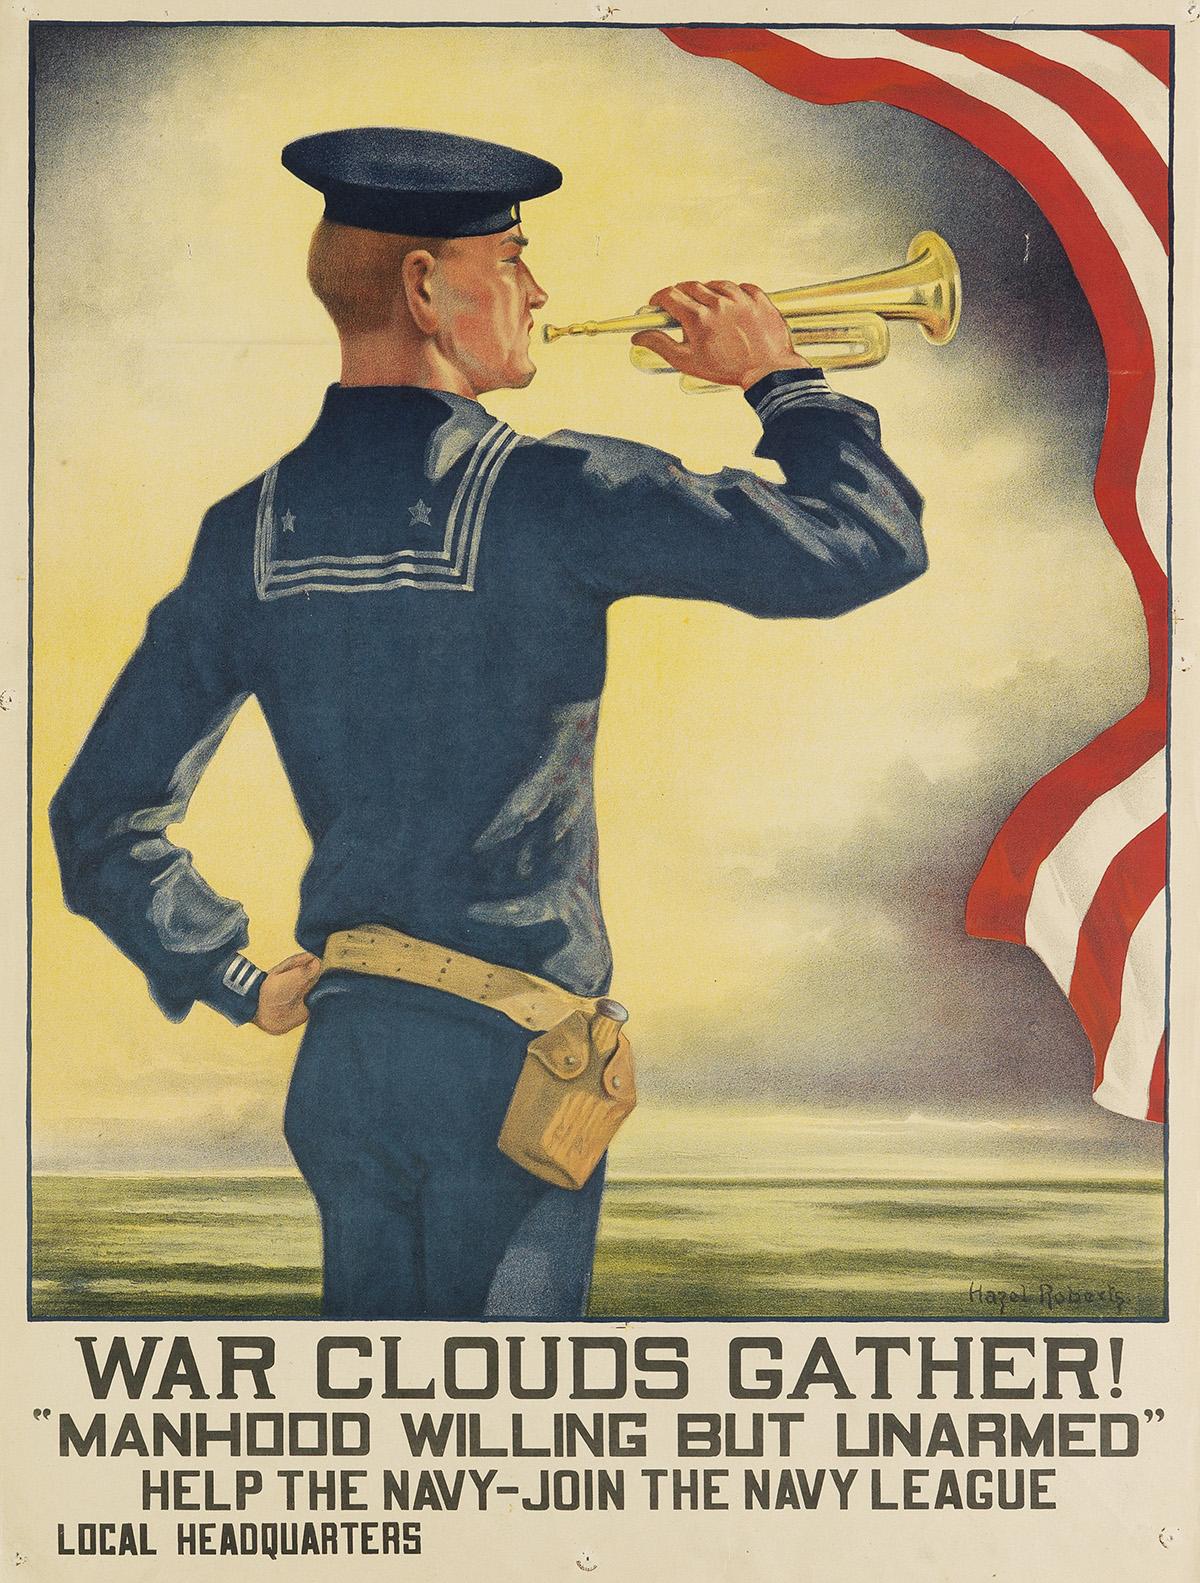 HAZEL-ROBERTS-(1883-1966)-WAR-CLOUDS-GATHER--MANHOOD-WILLING